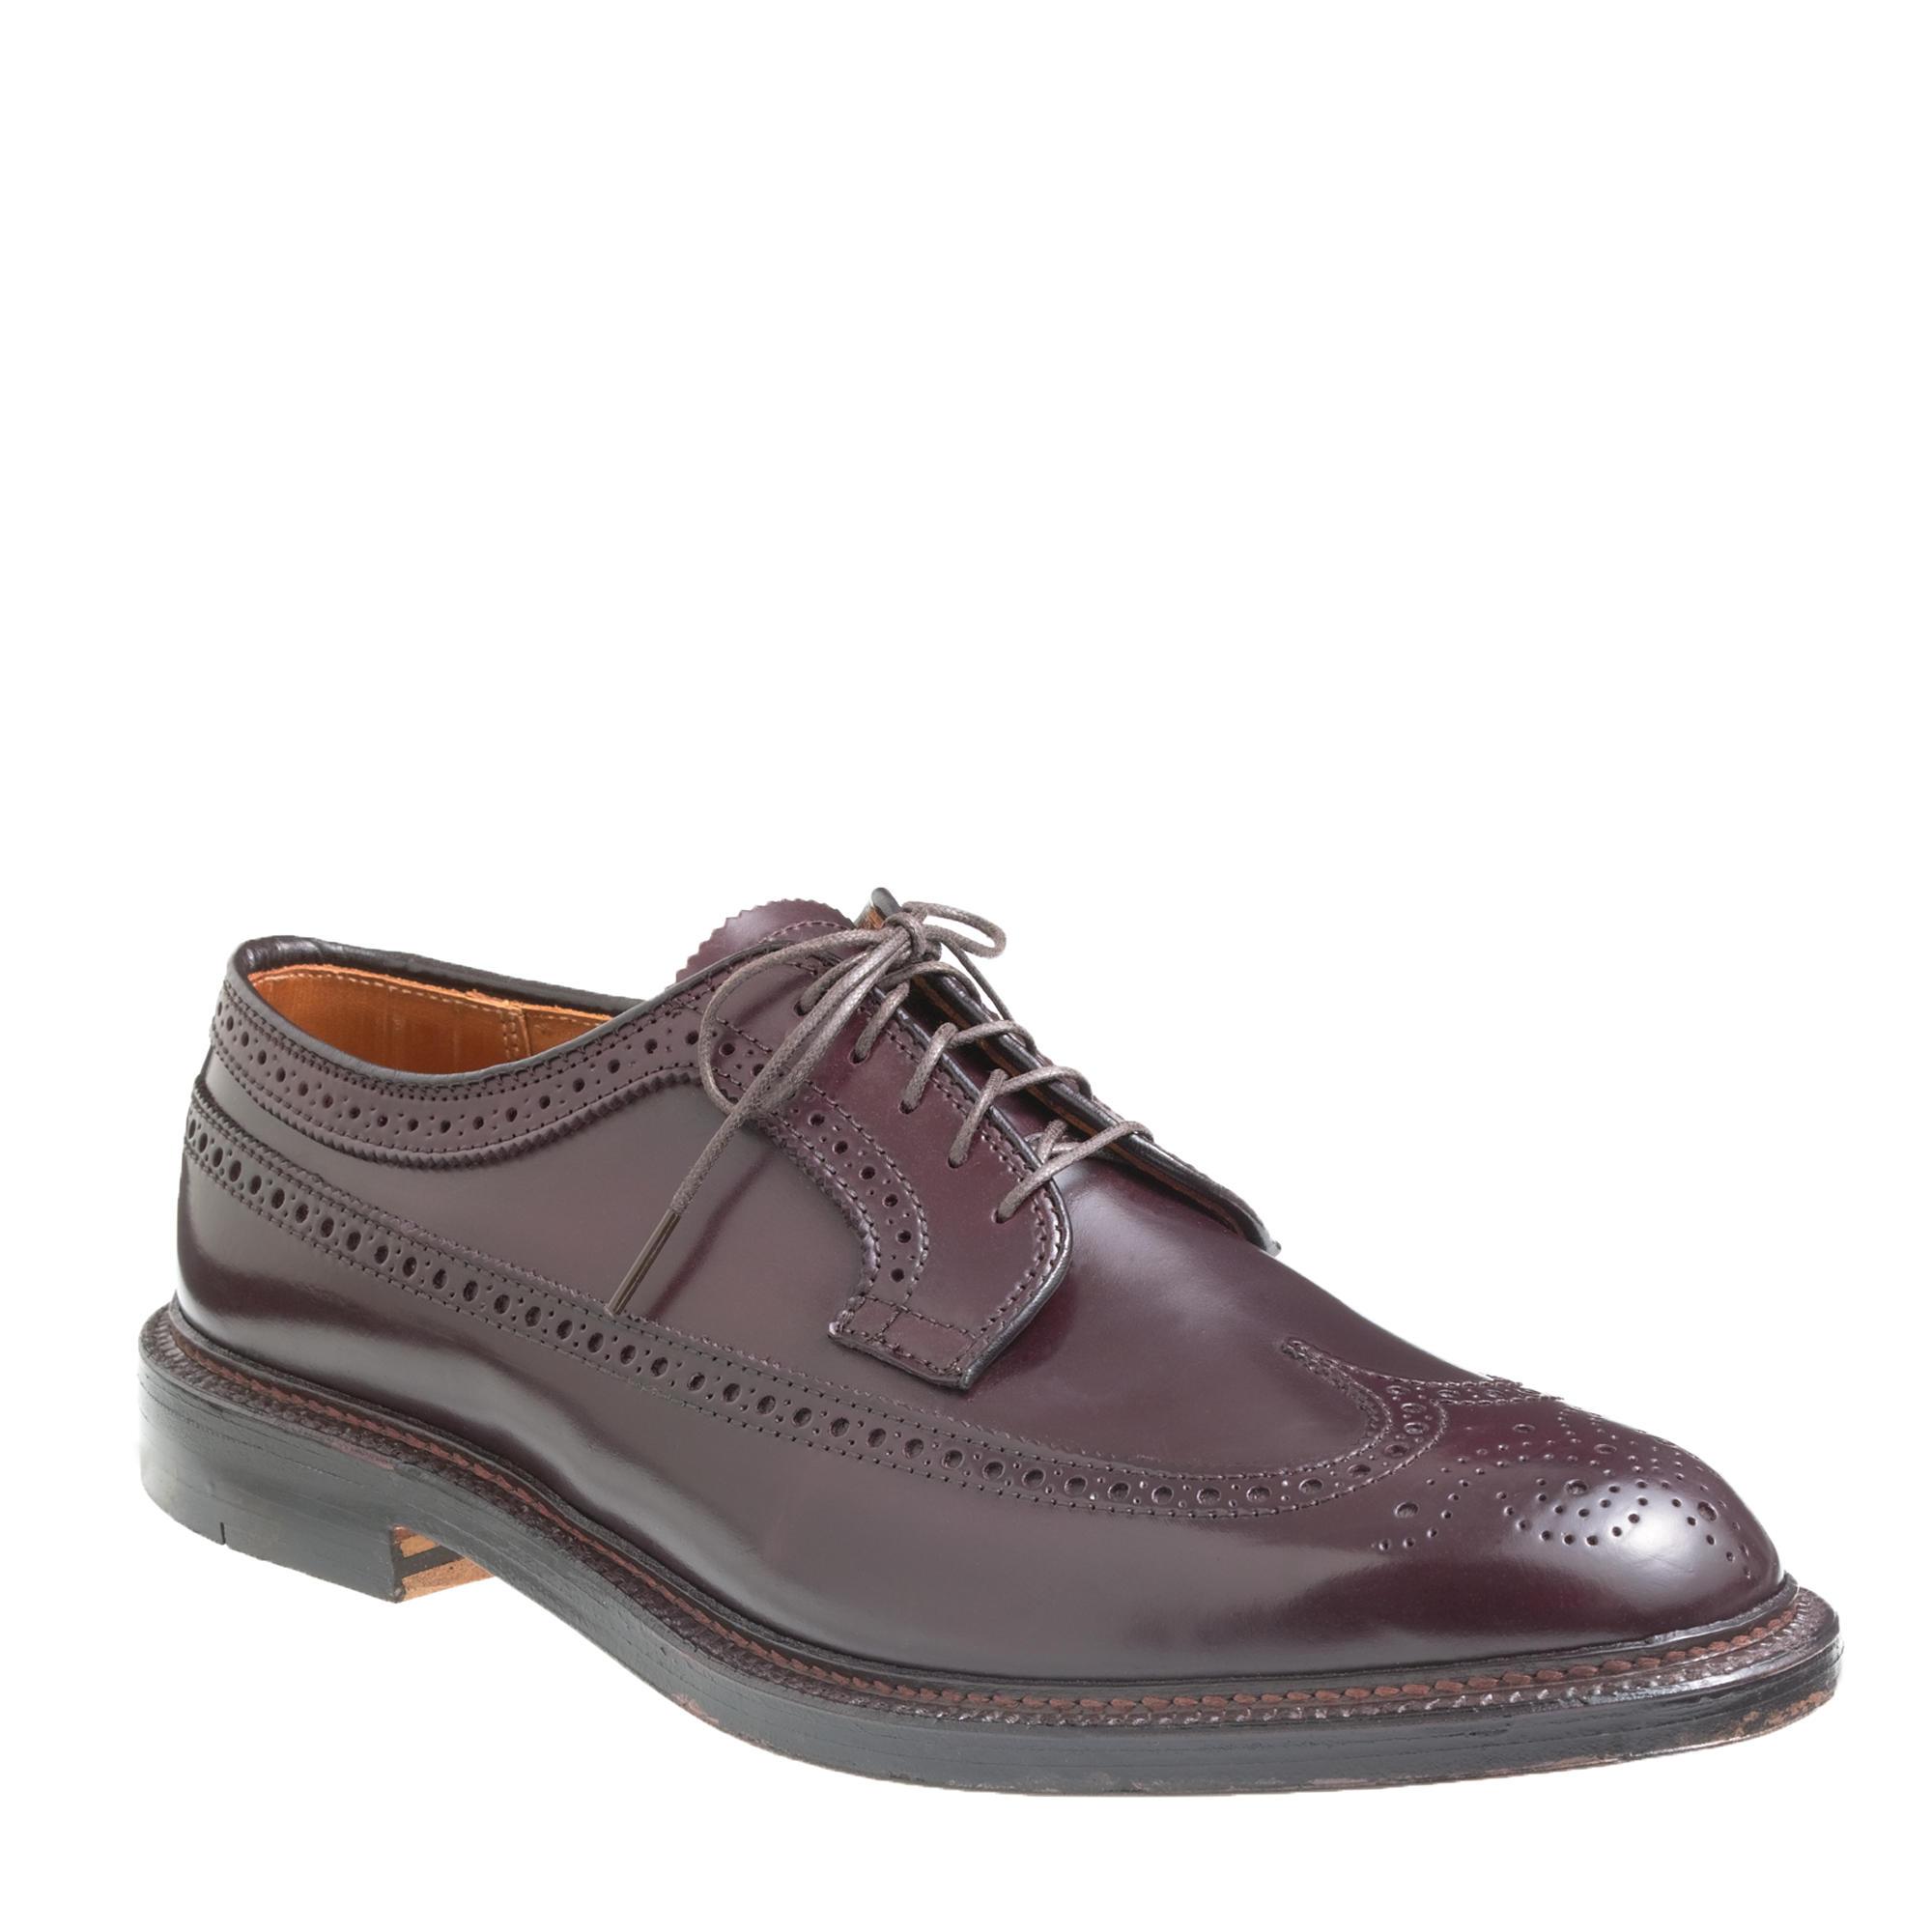 J Crew Mens Shoes Massachusetts